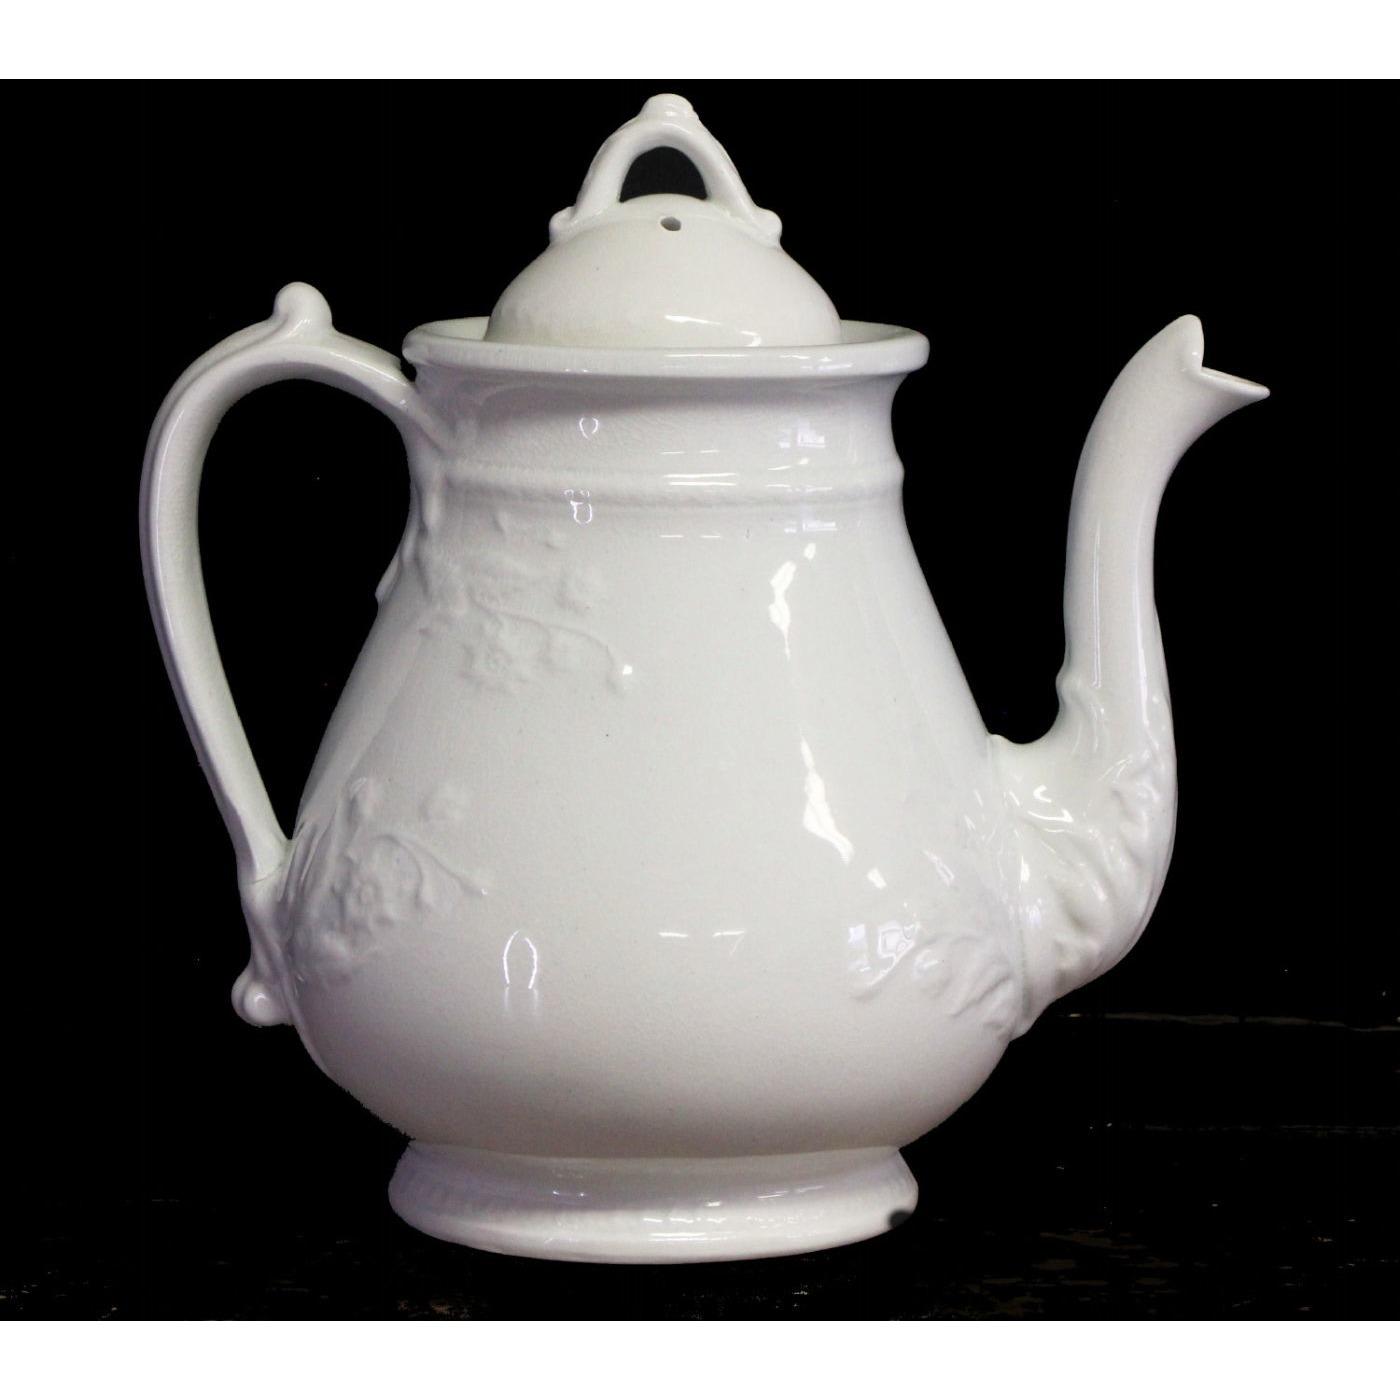 Unusual Floral Ironstone Teapot - Beautiful